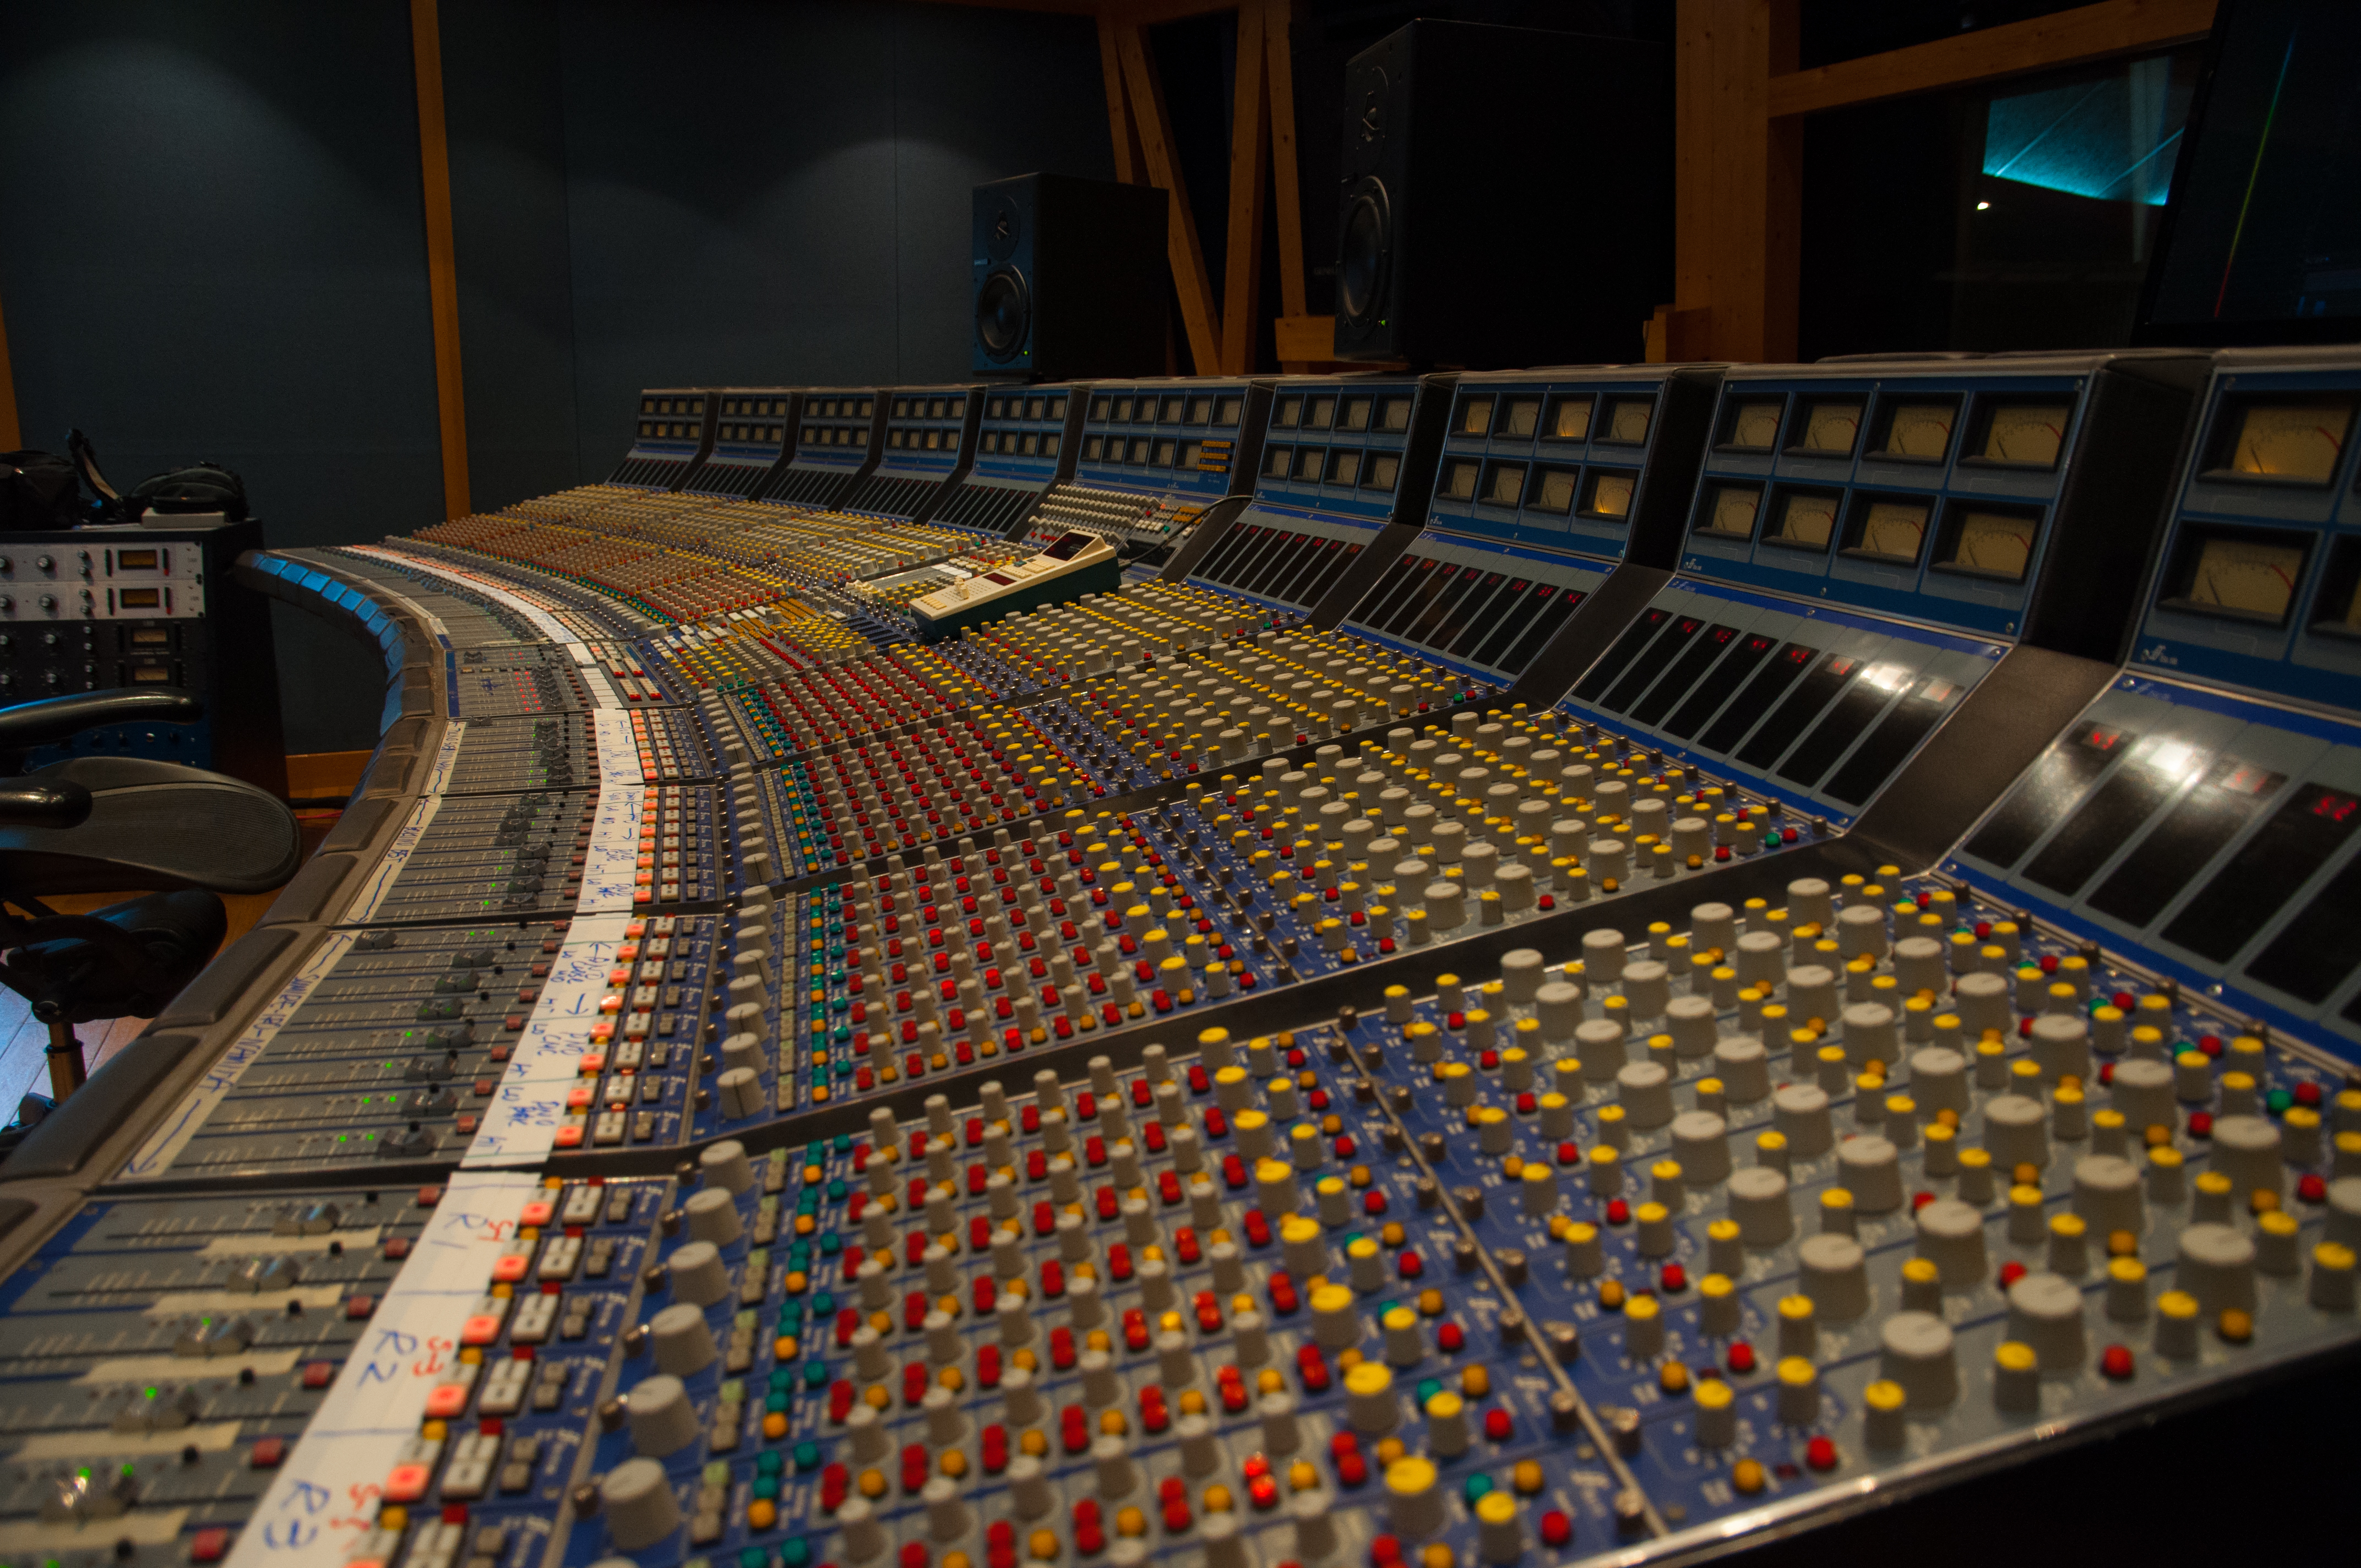 File:Focusrite Studio Console @ Sound City Setagaya DSC 1931 jpg